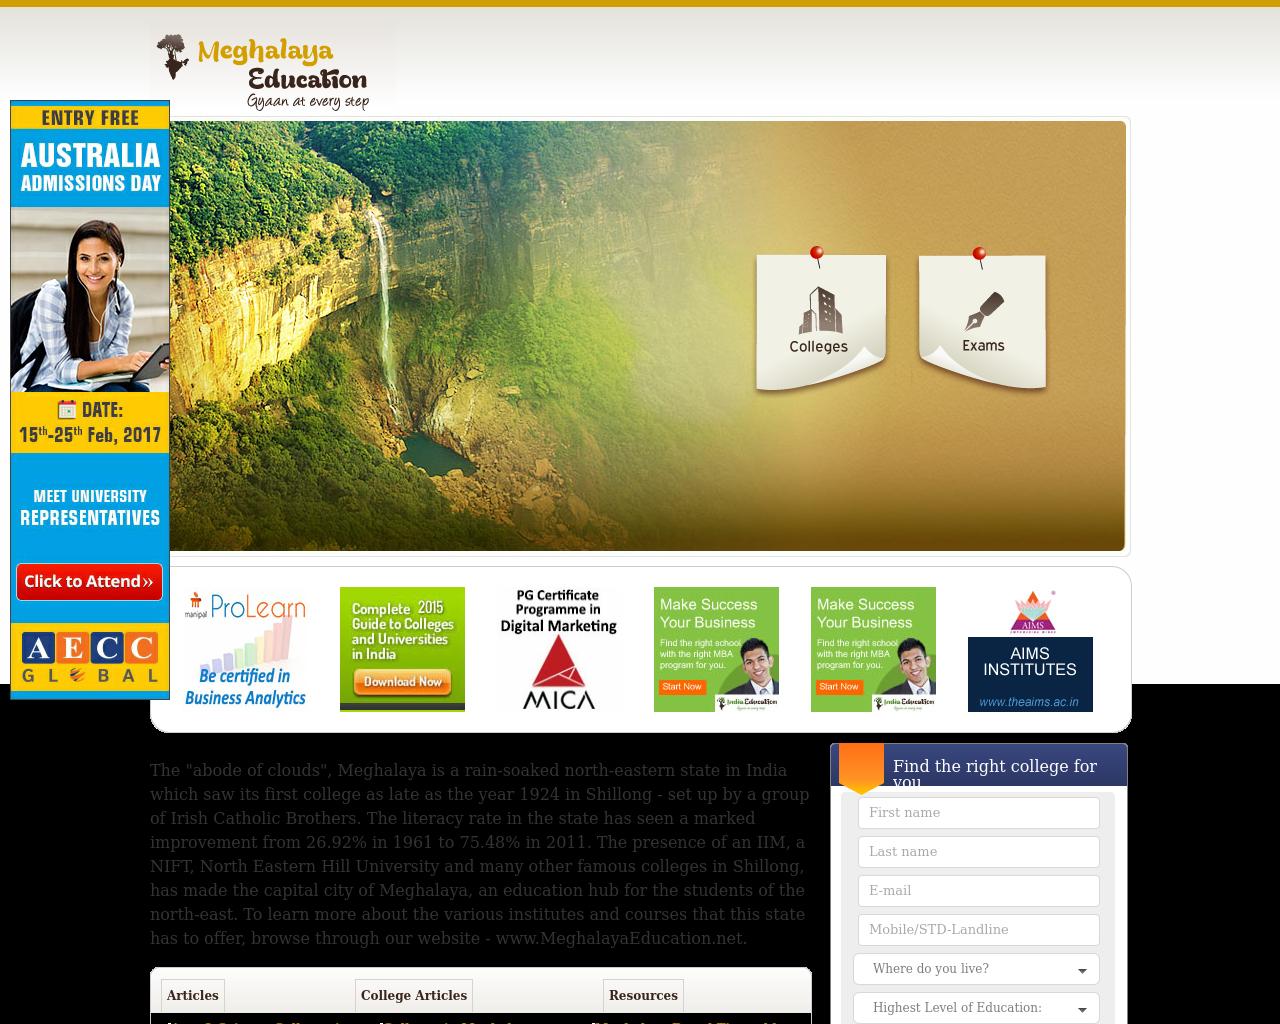 Meghalaya-Education-Advertising-Reviews-Pricing